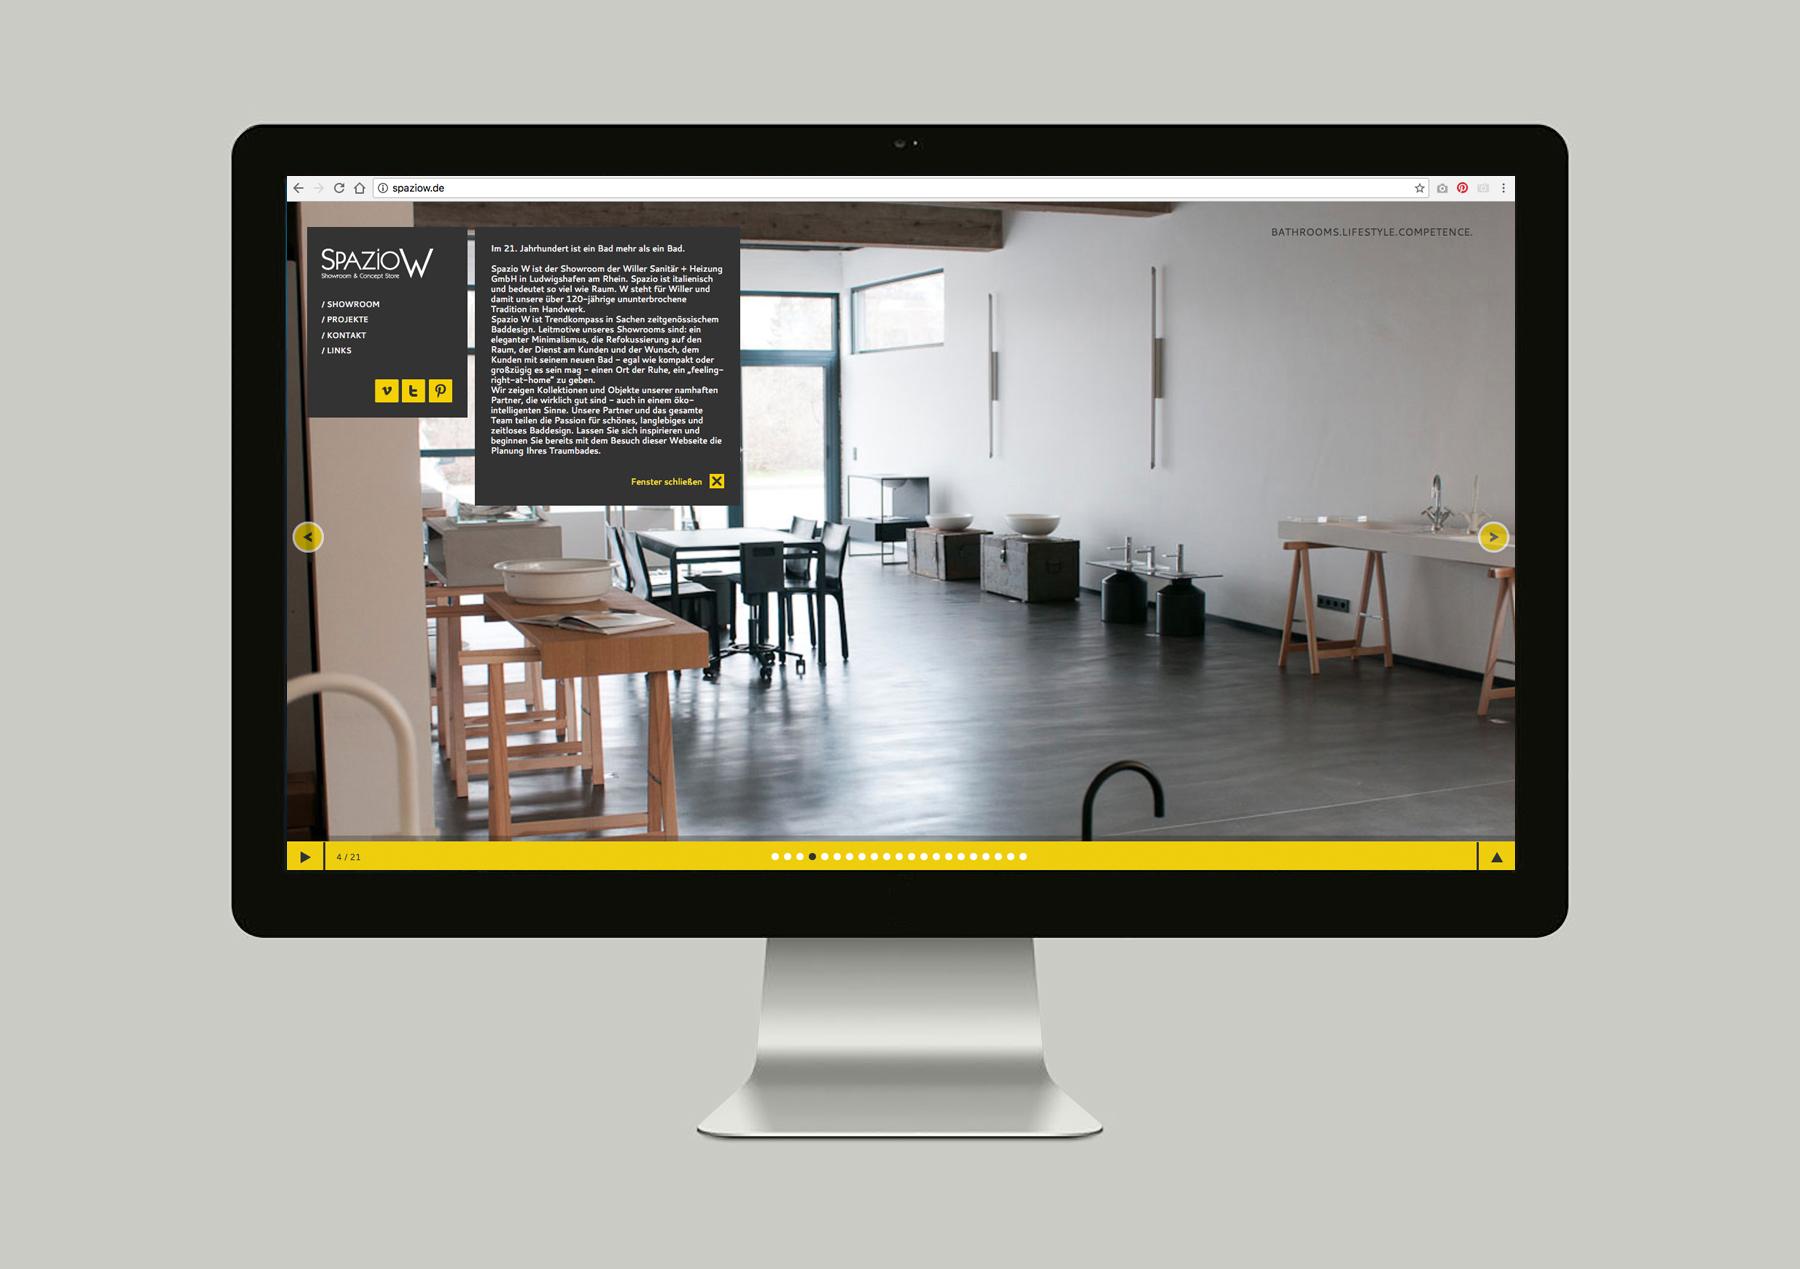 spaziow-web2